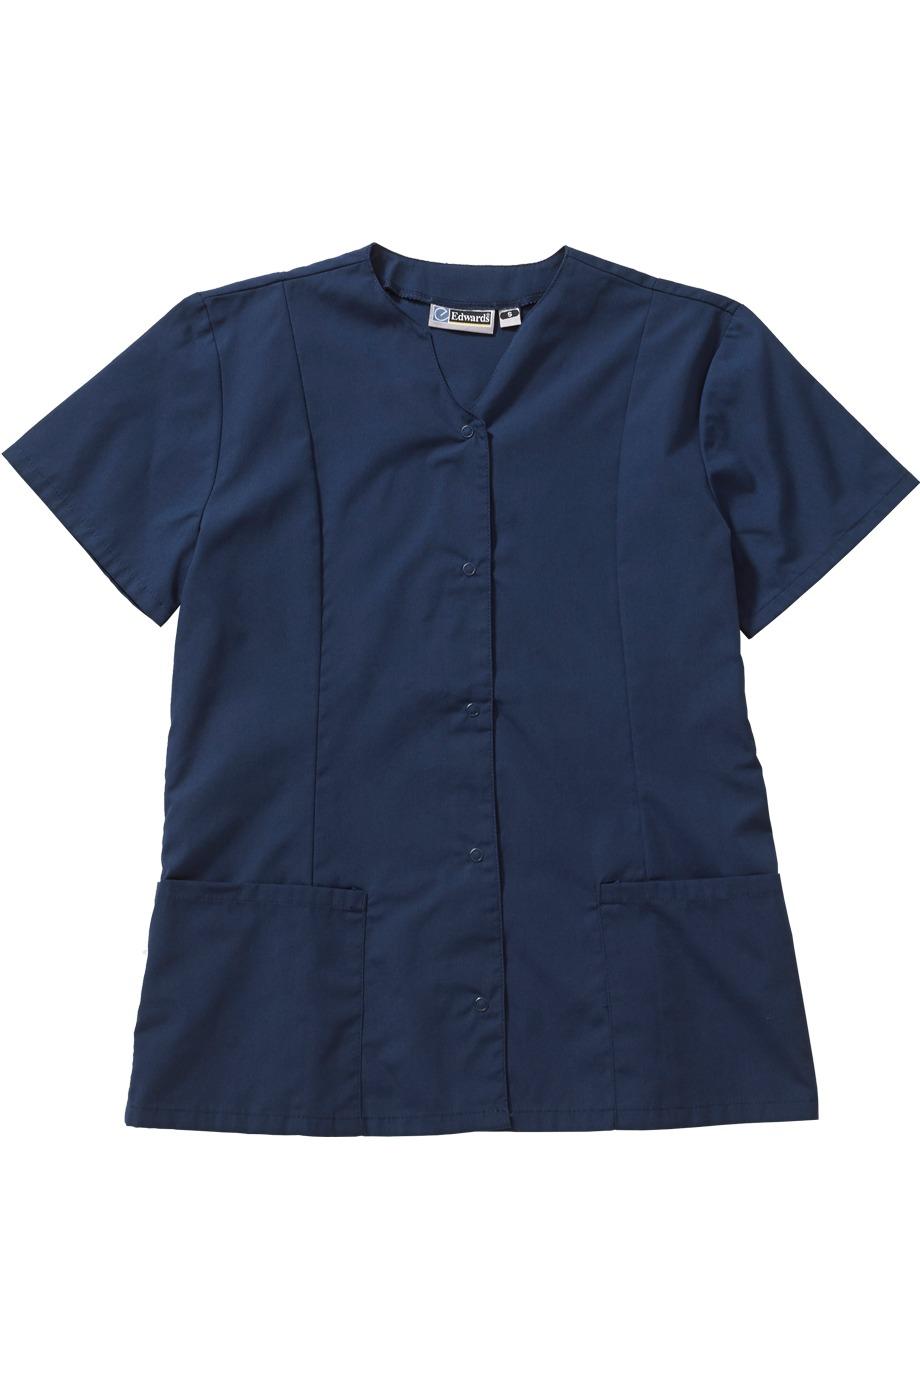 Edwards Garment 7889 - Scrub Zone Snap Front Tunic